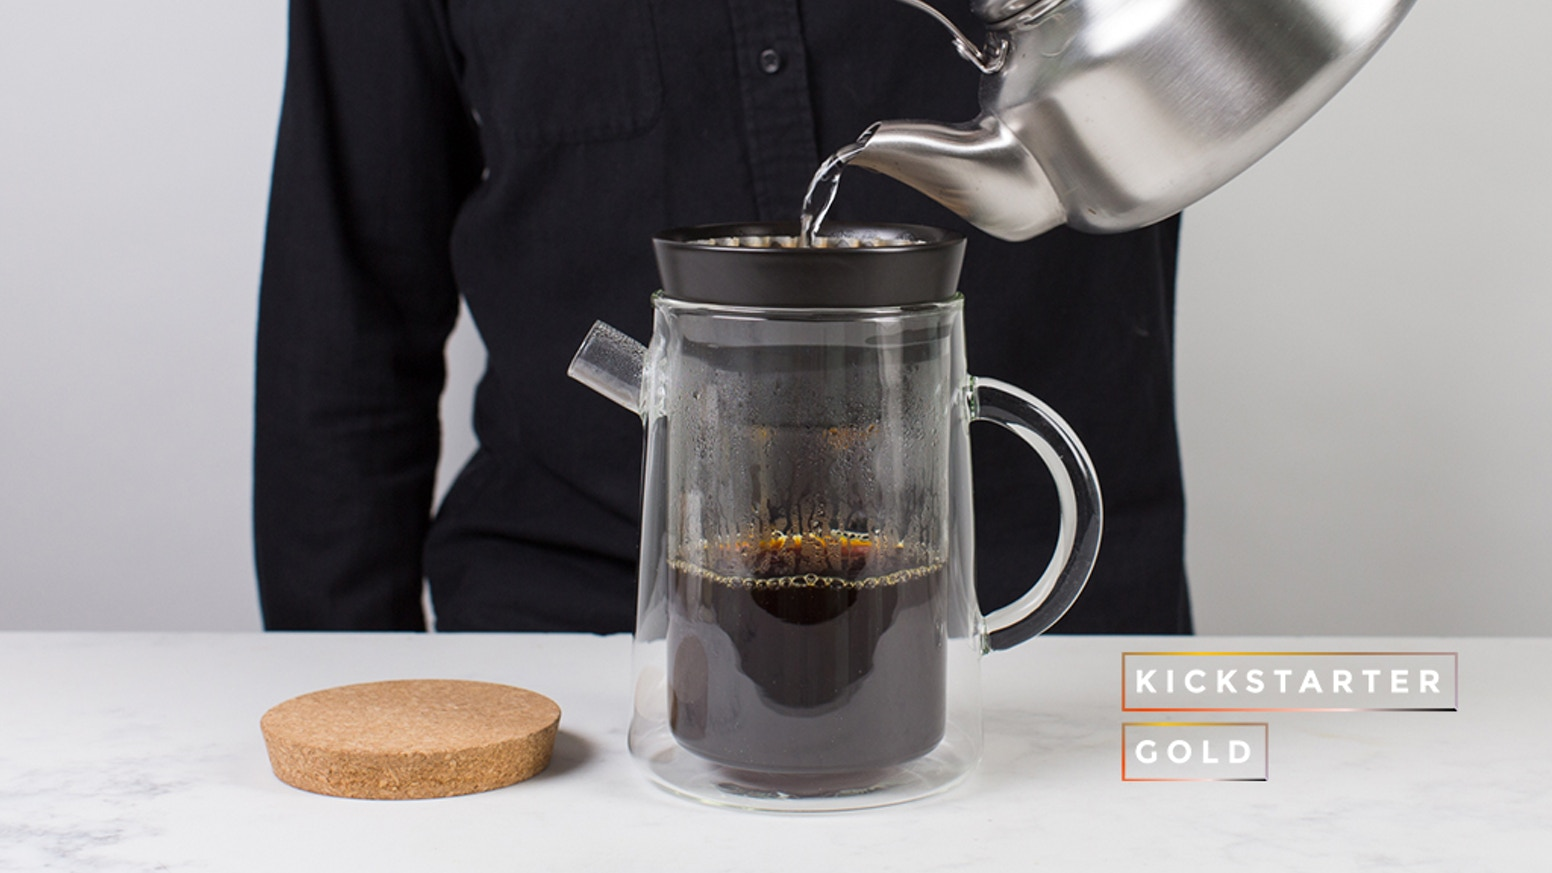 Manual Coffee Maker ~ Kickstarter gold manual coffeemaker nº by craighton